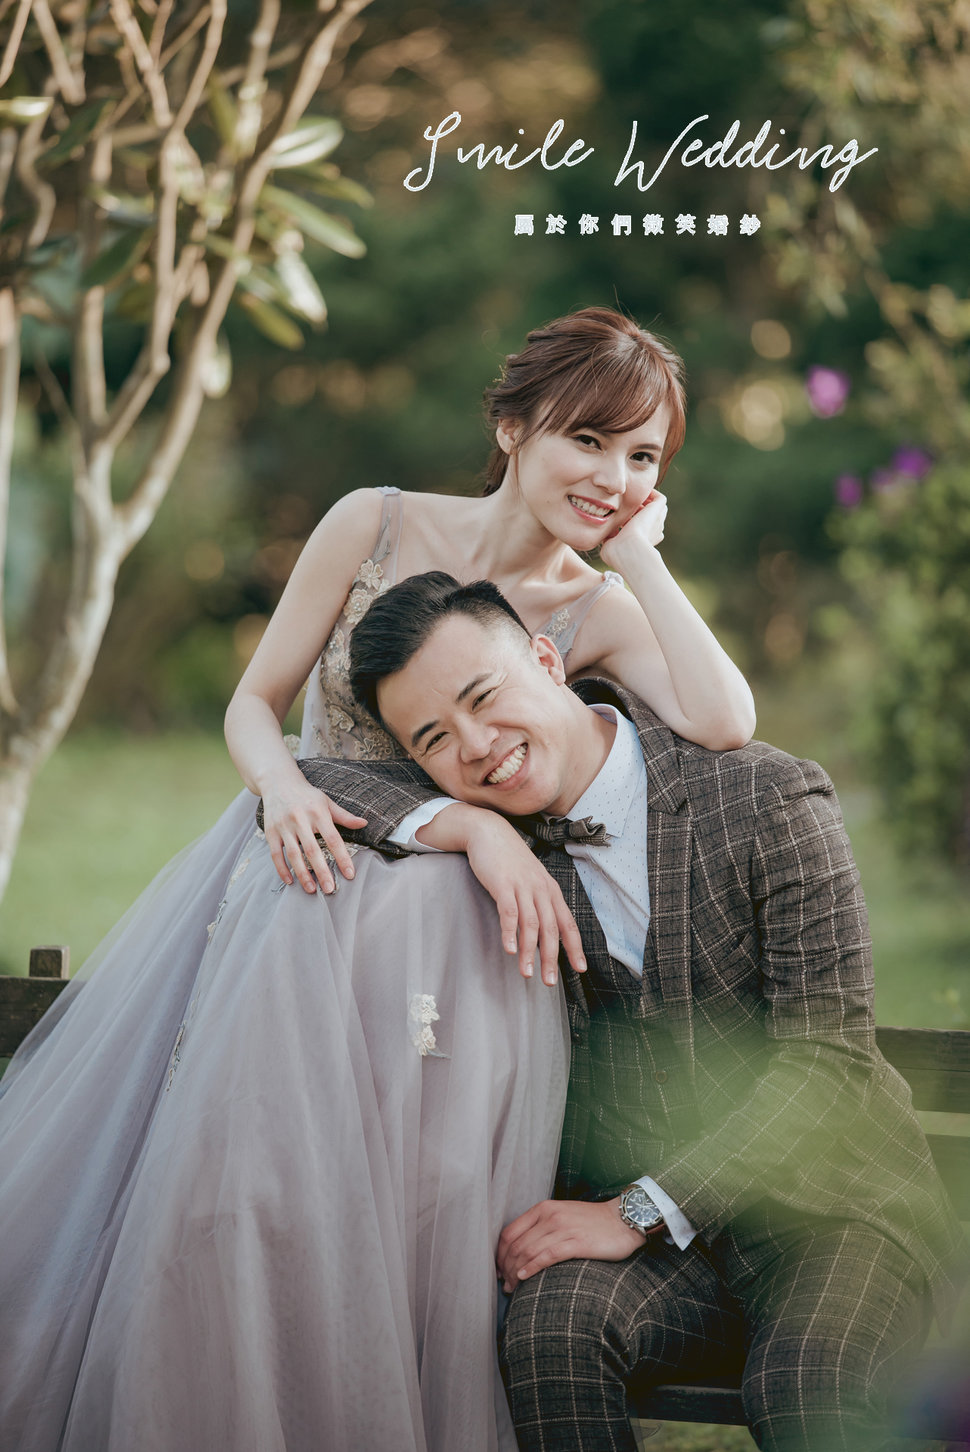 WEI_3255 - Smile wedding 微笑婚紗《結婚吧》